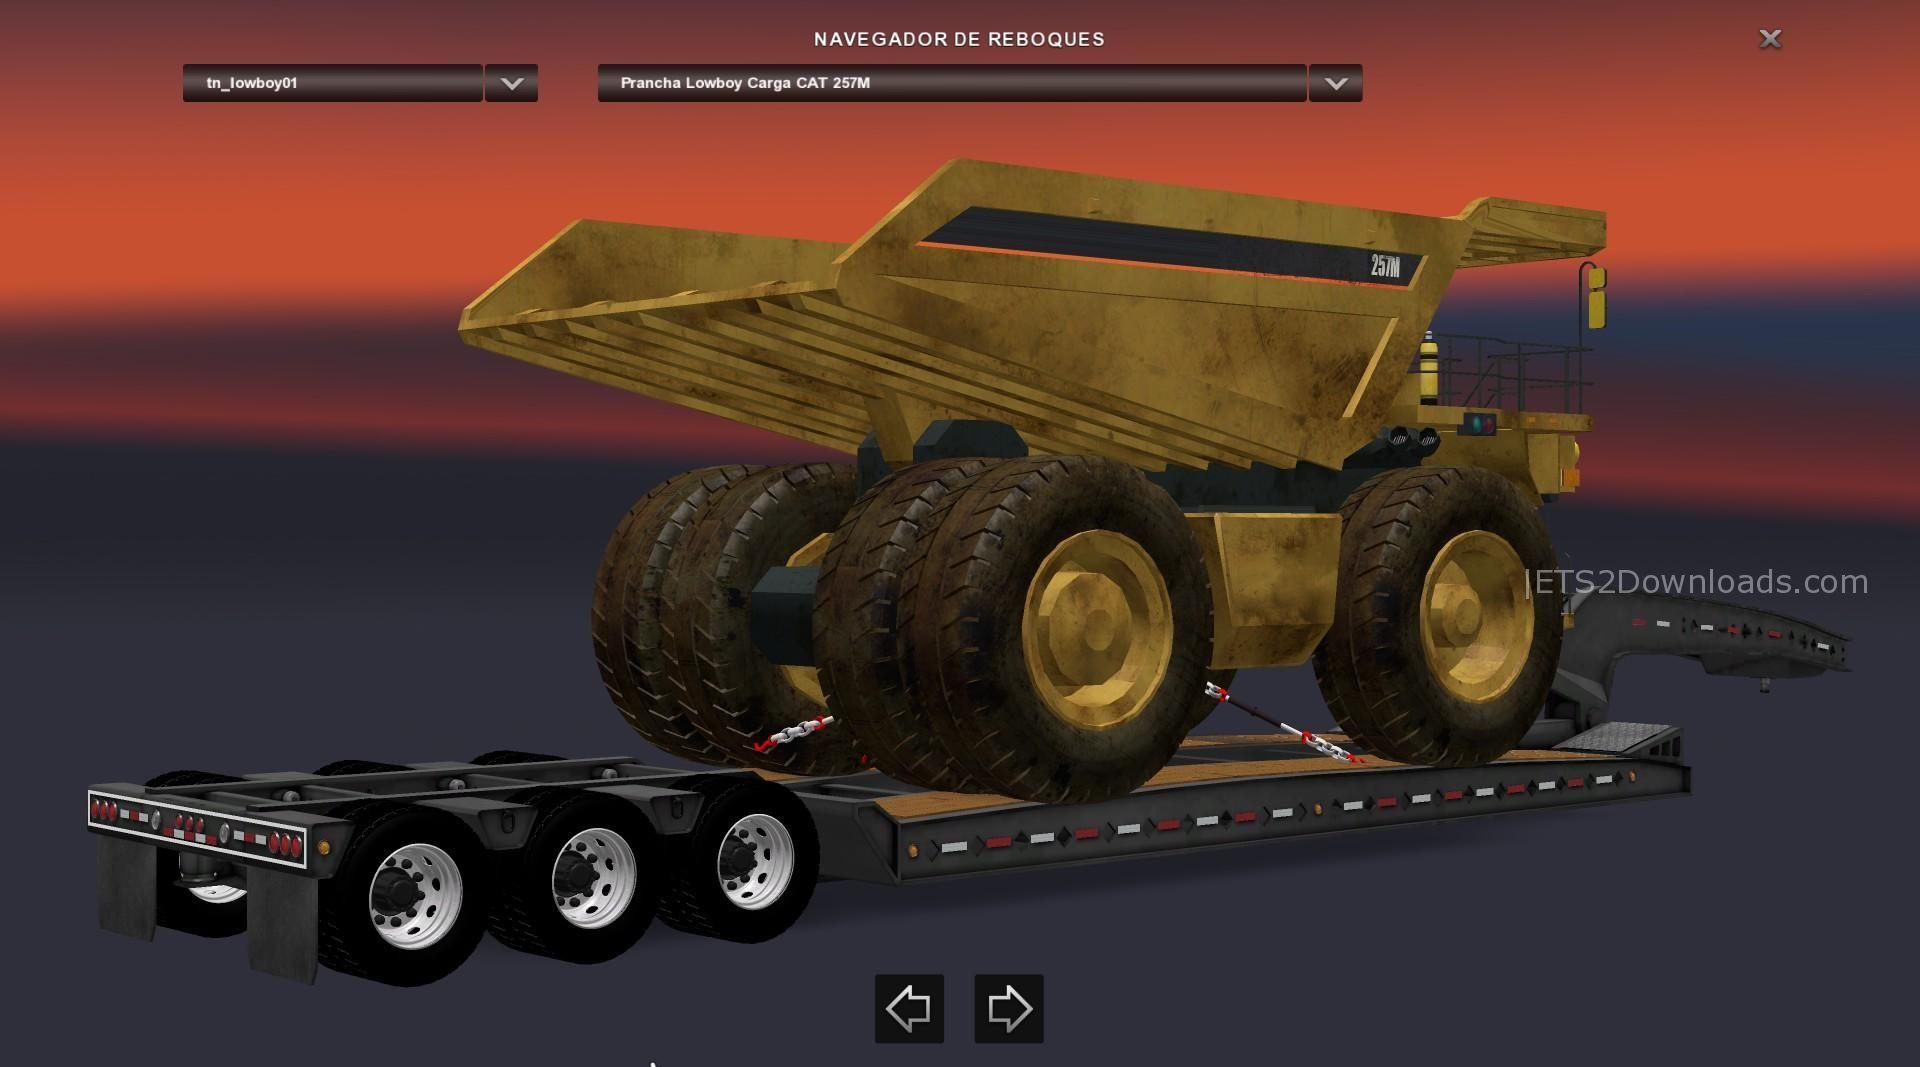 trailer-lowboy-cat-257m-2